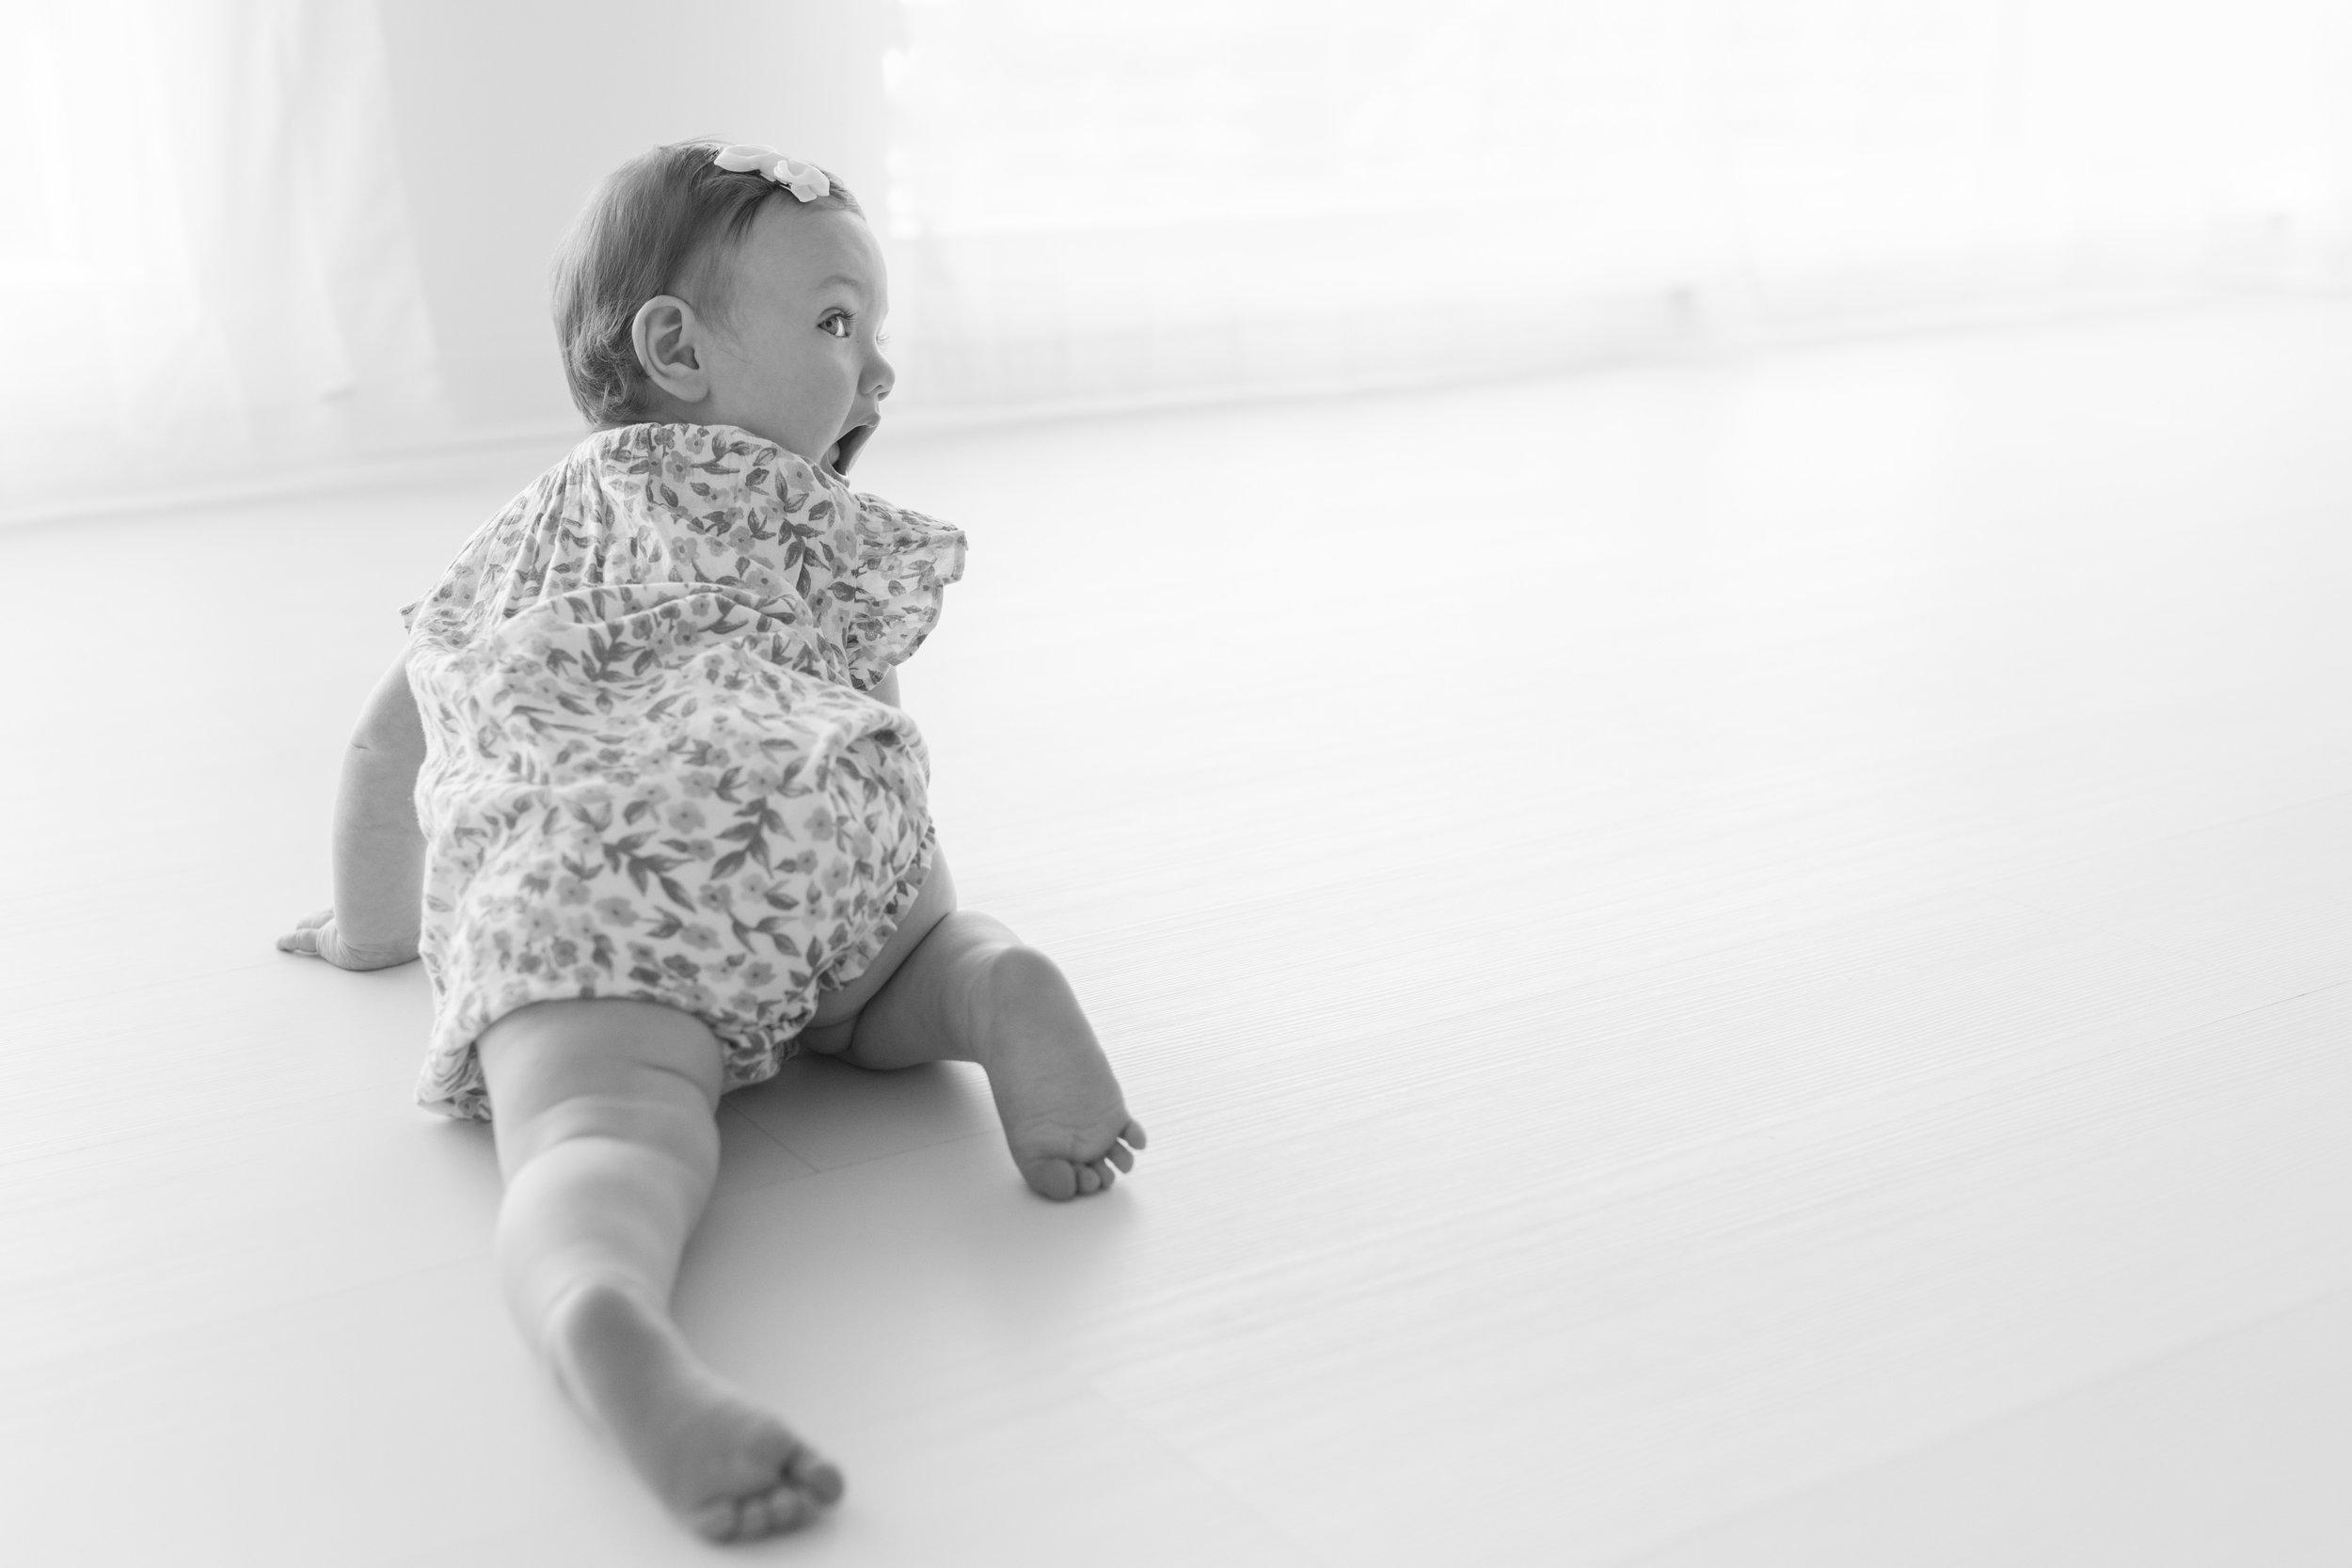 JennyPerryPhotography-LeightonBryanOneYear2018PRINT-40.jpg